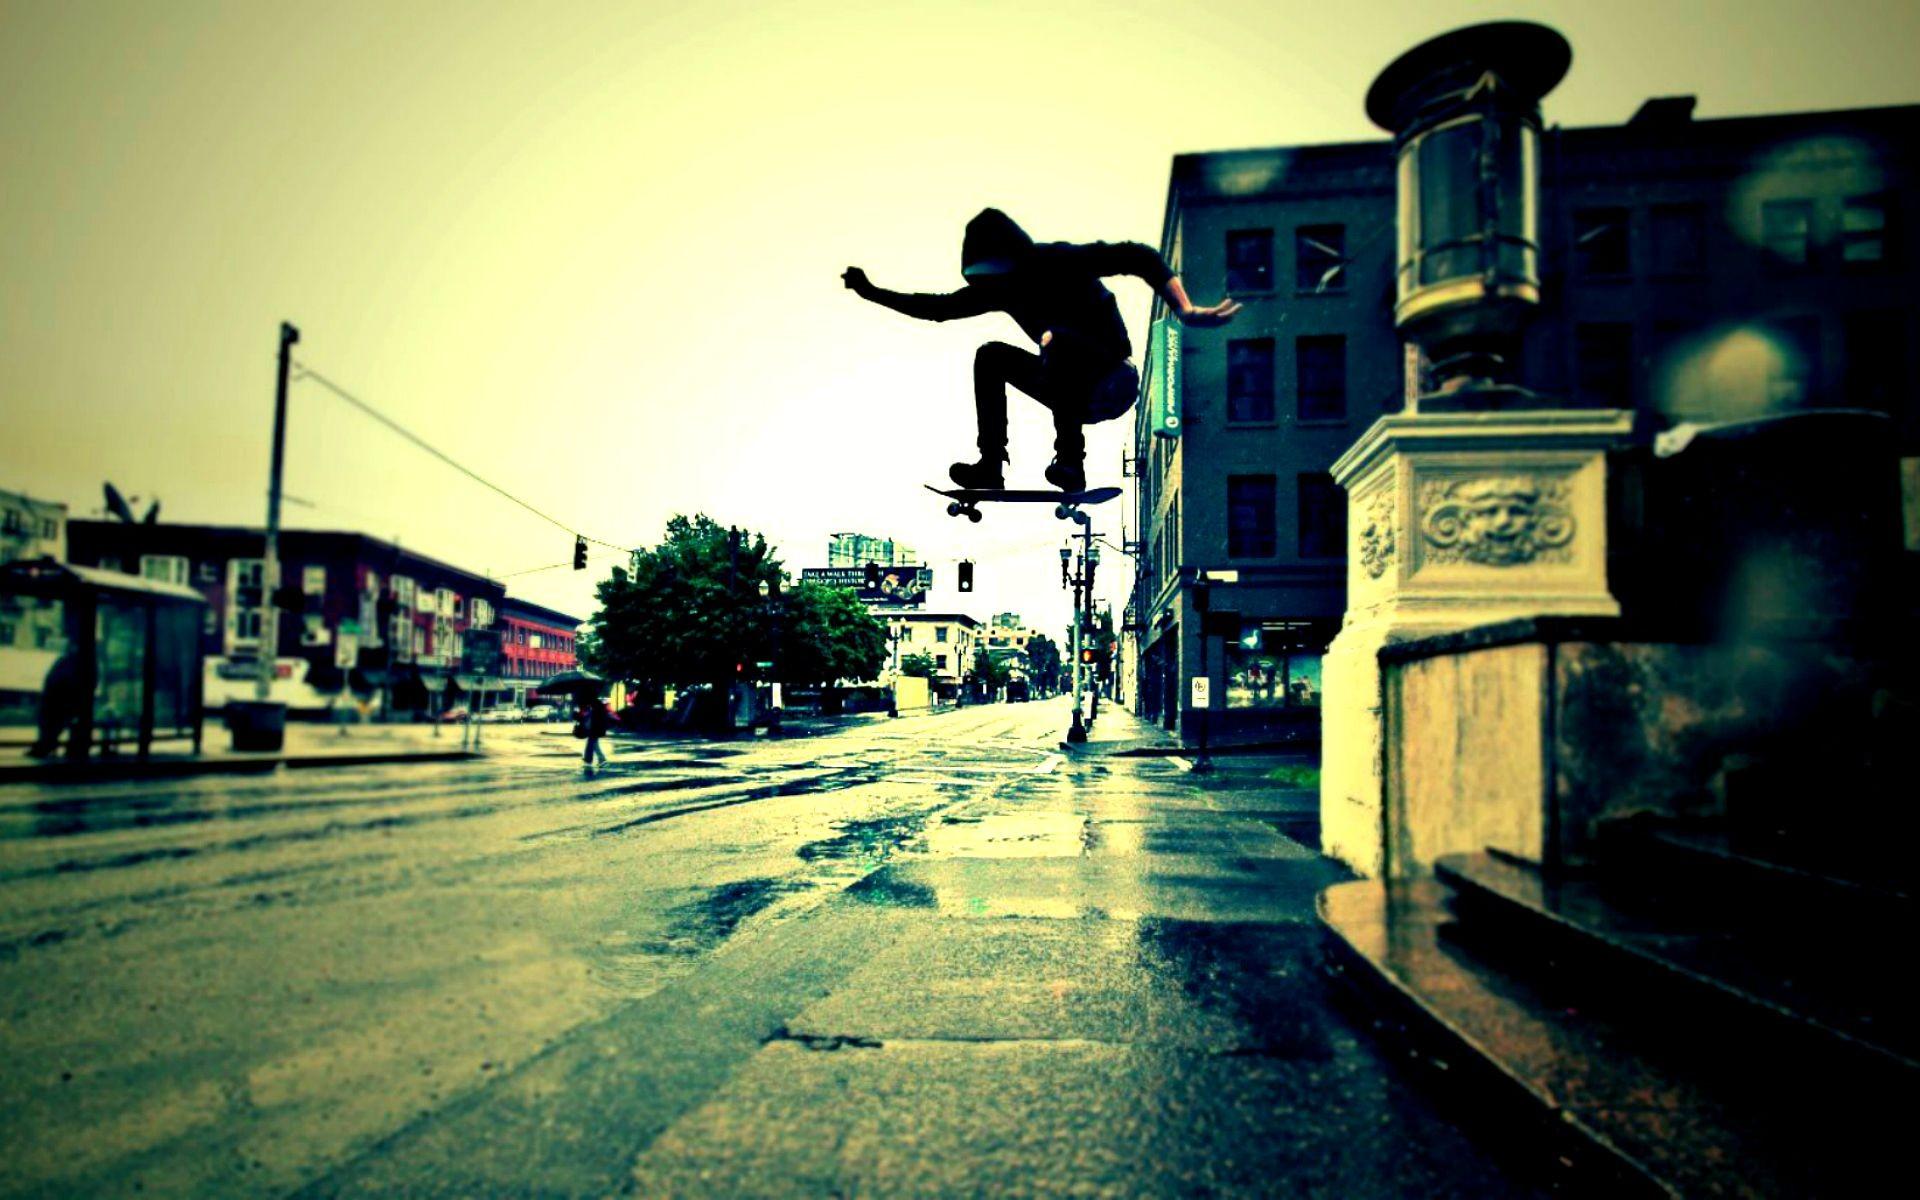 Urban skateboard trick